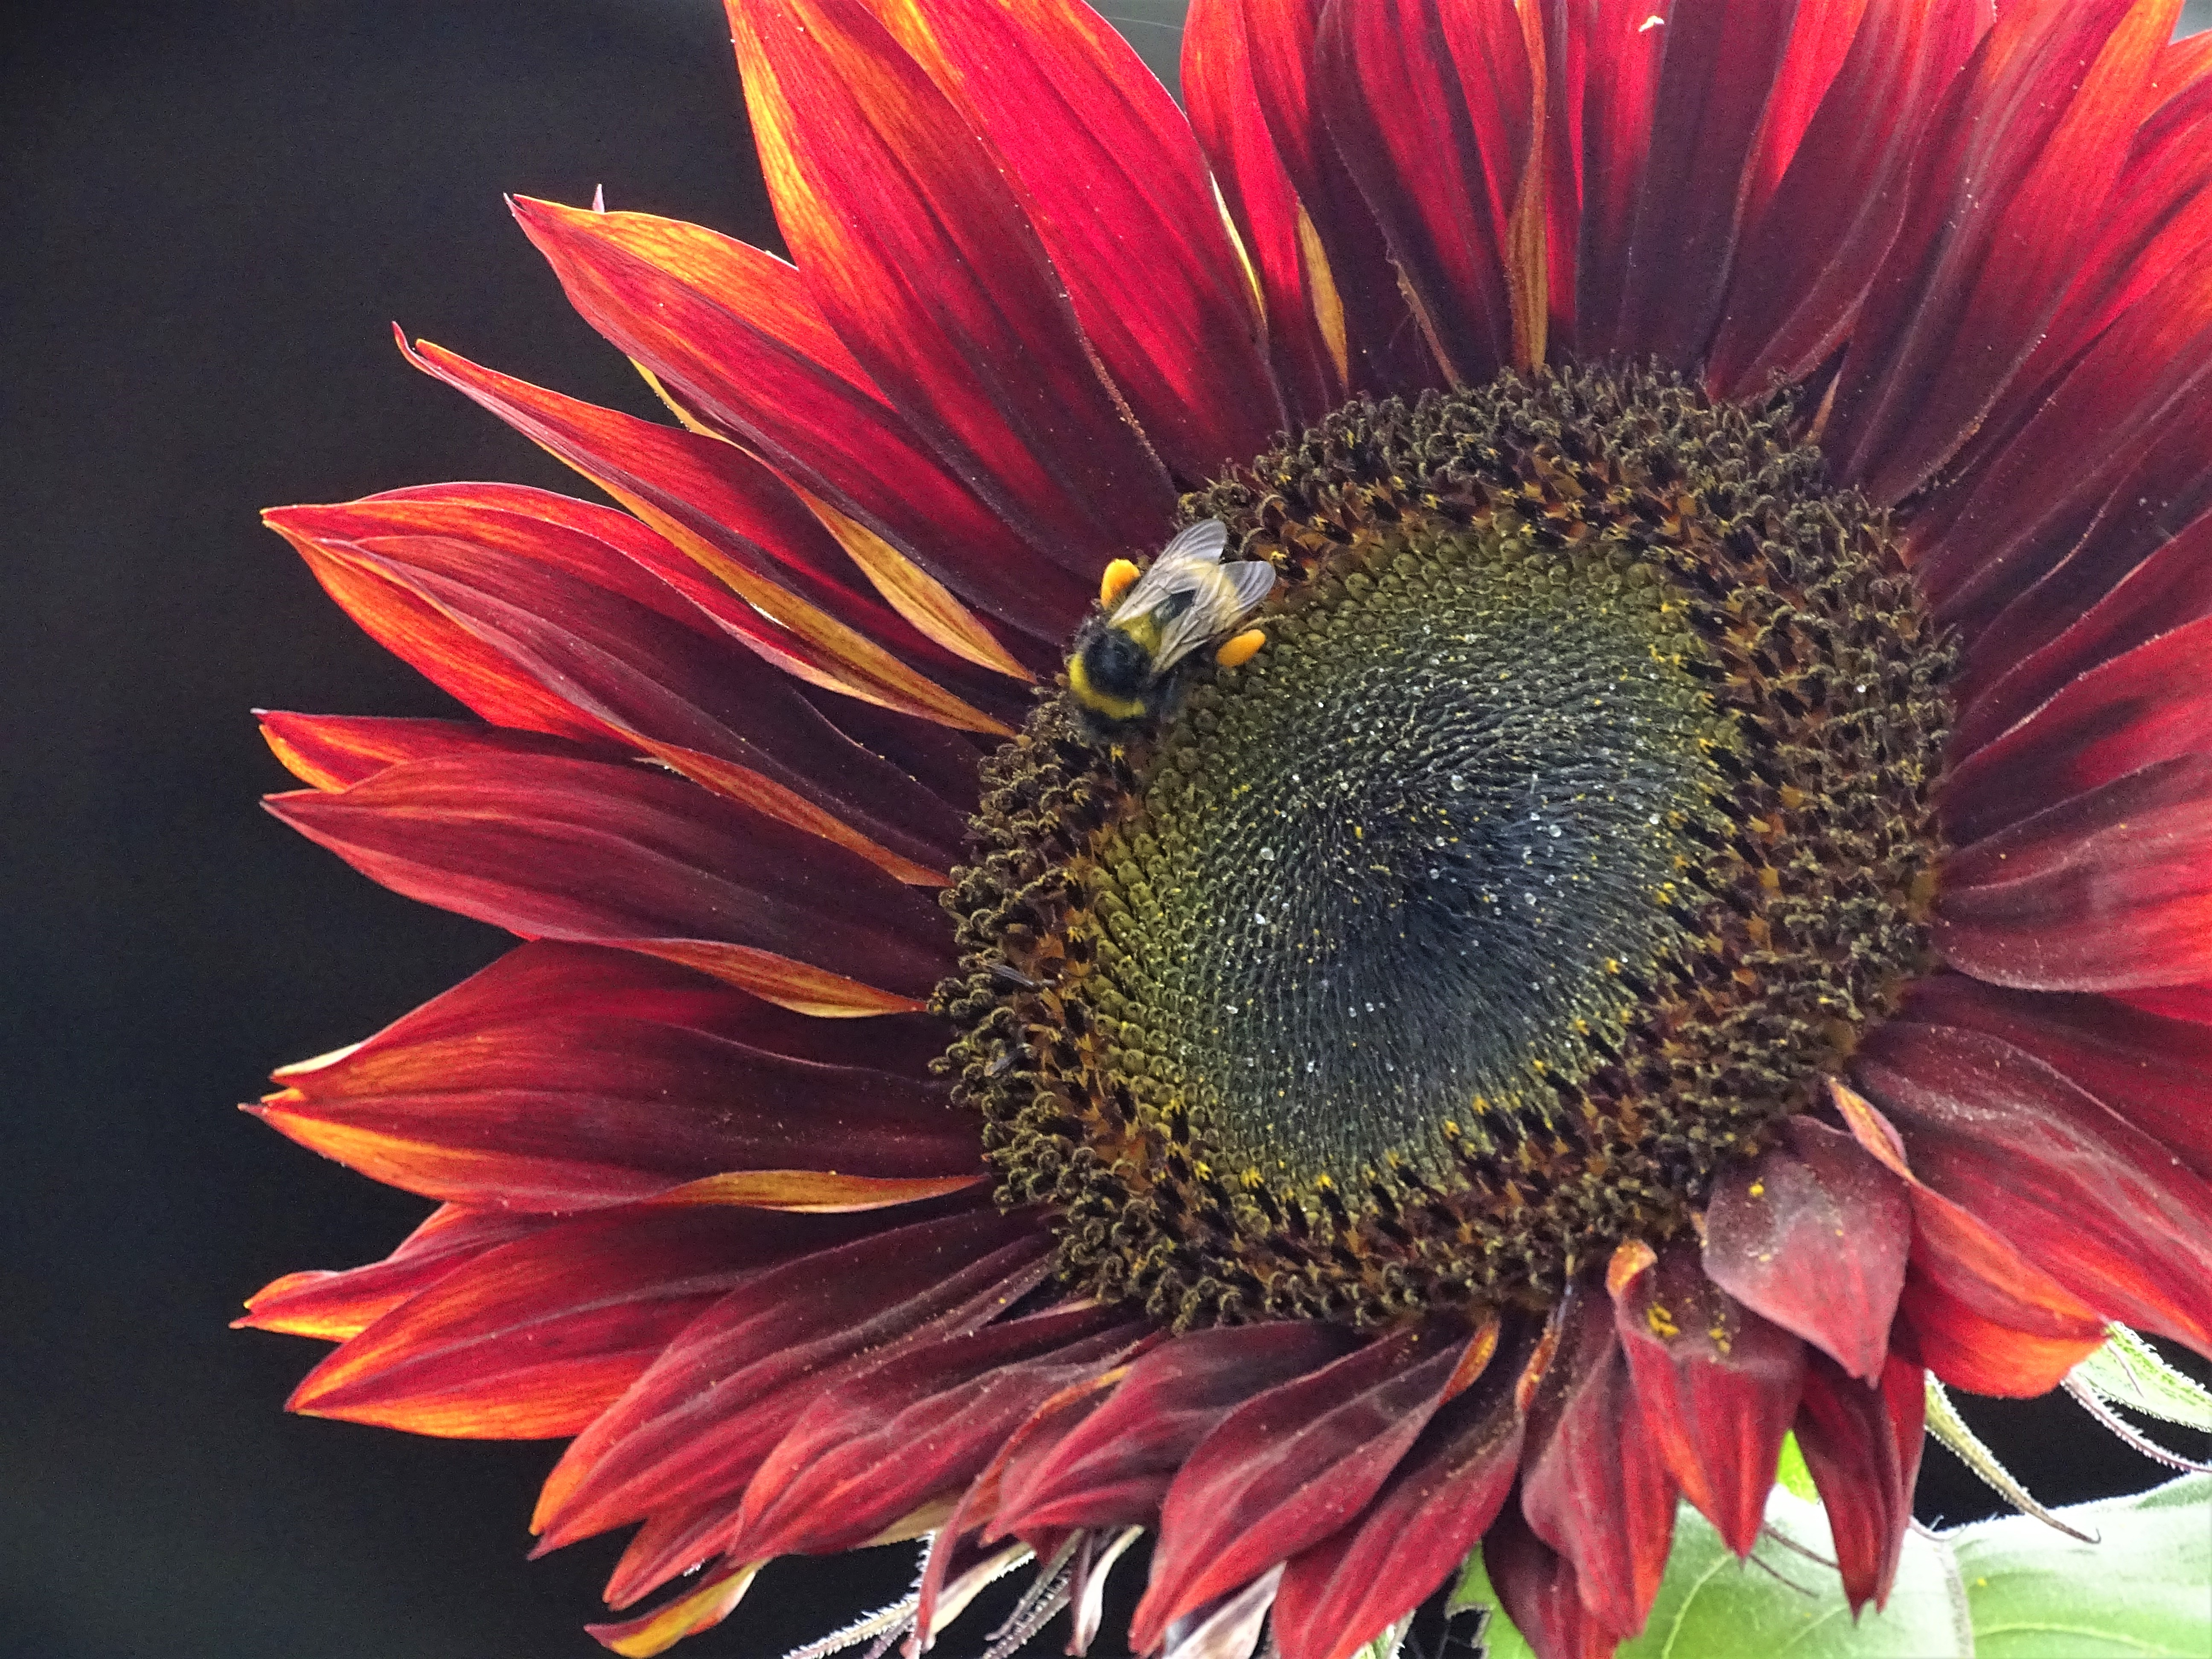 Rote-Sonnenblume-Fotos-Nadia-Baumgart